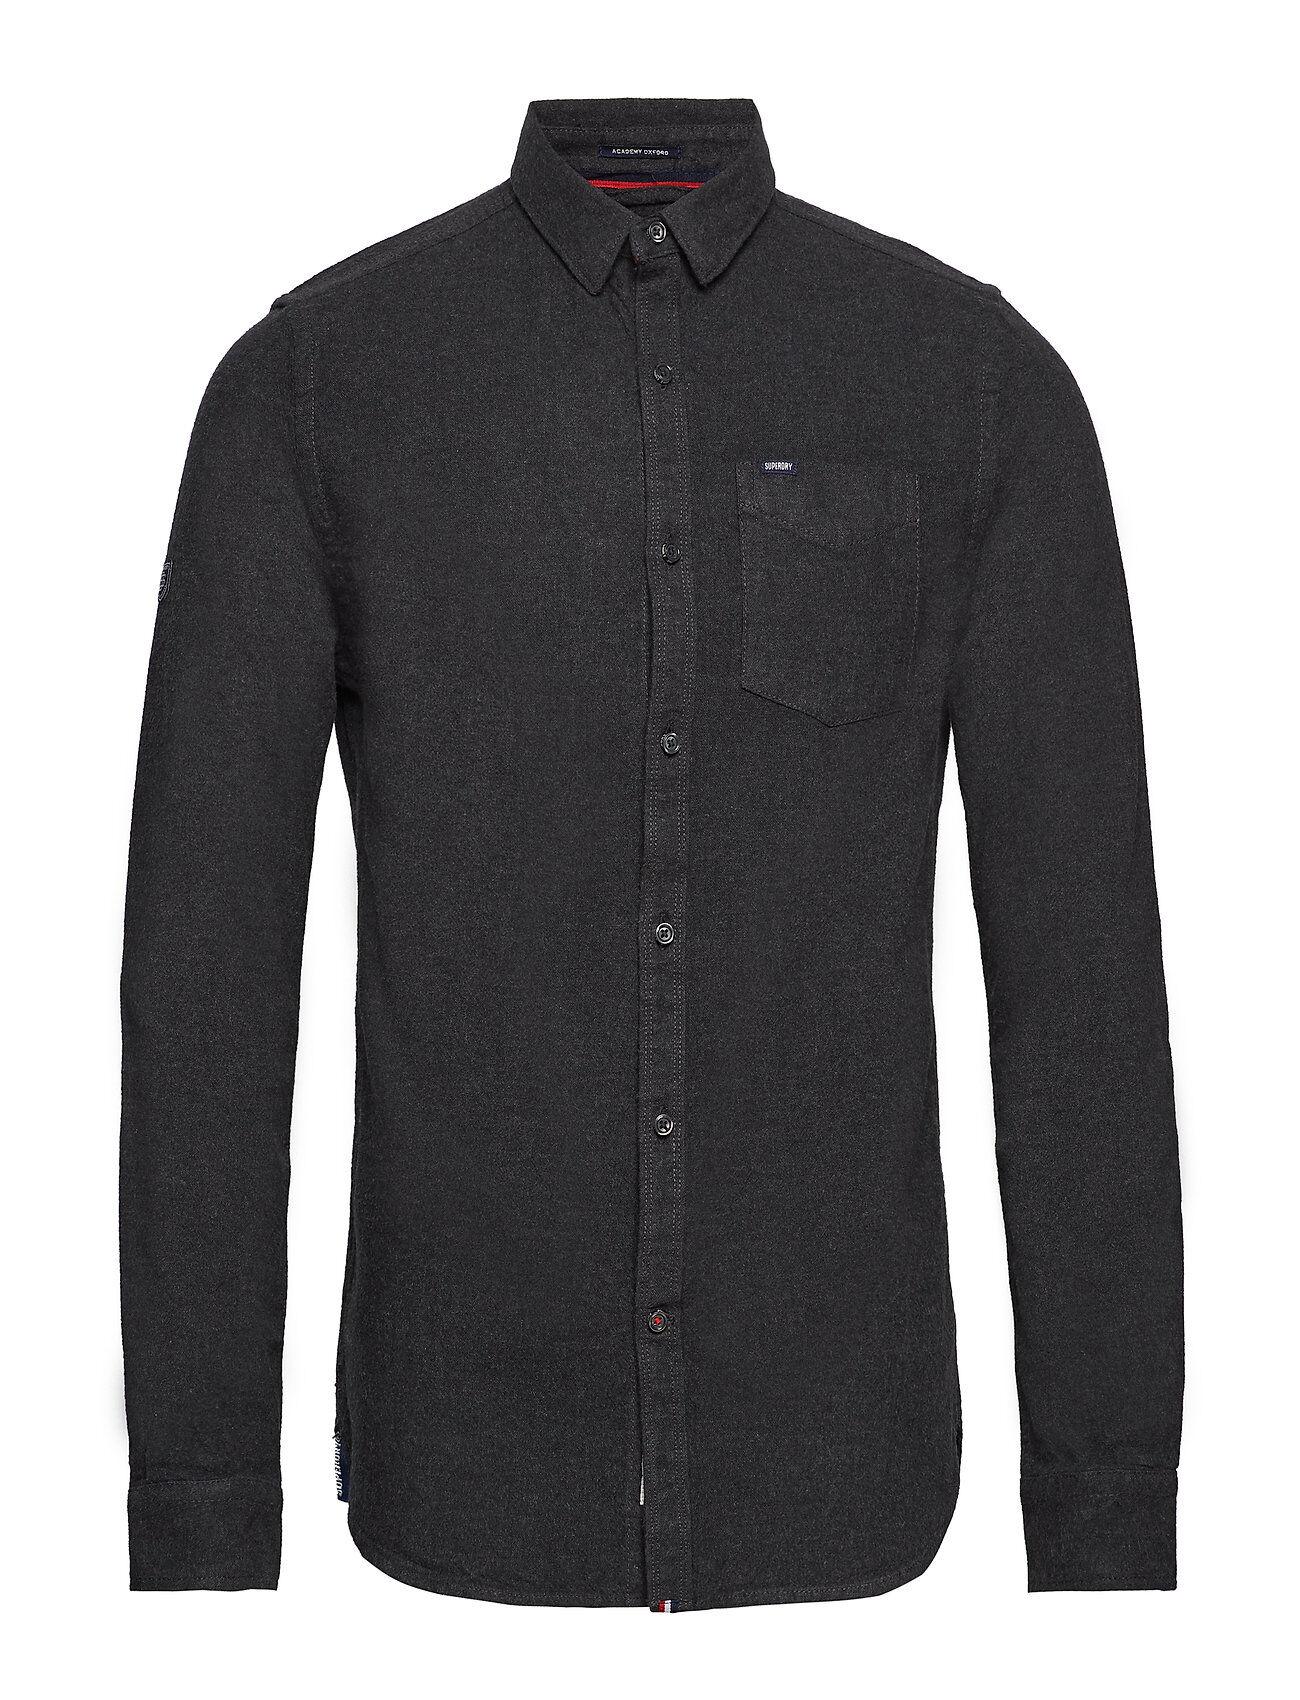 Superdry Academy Oxford Shirt